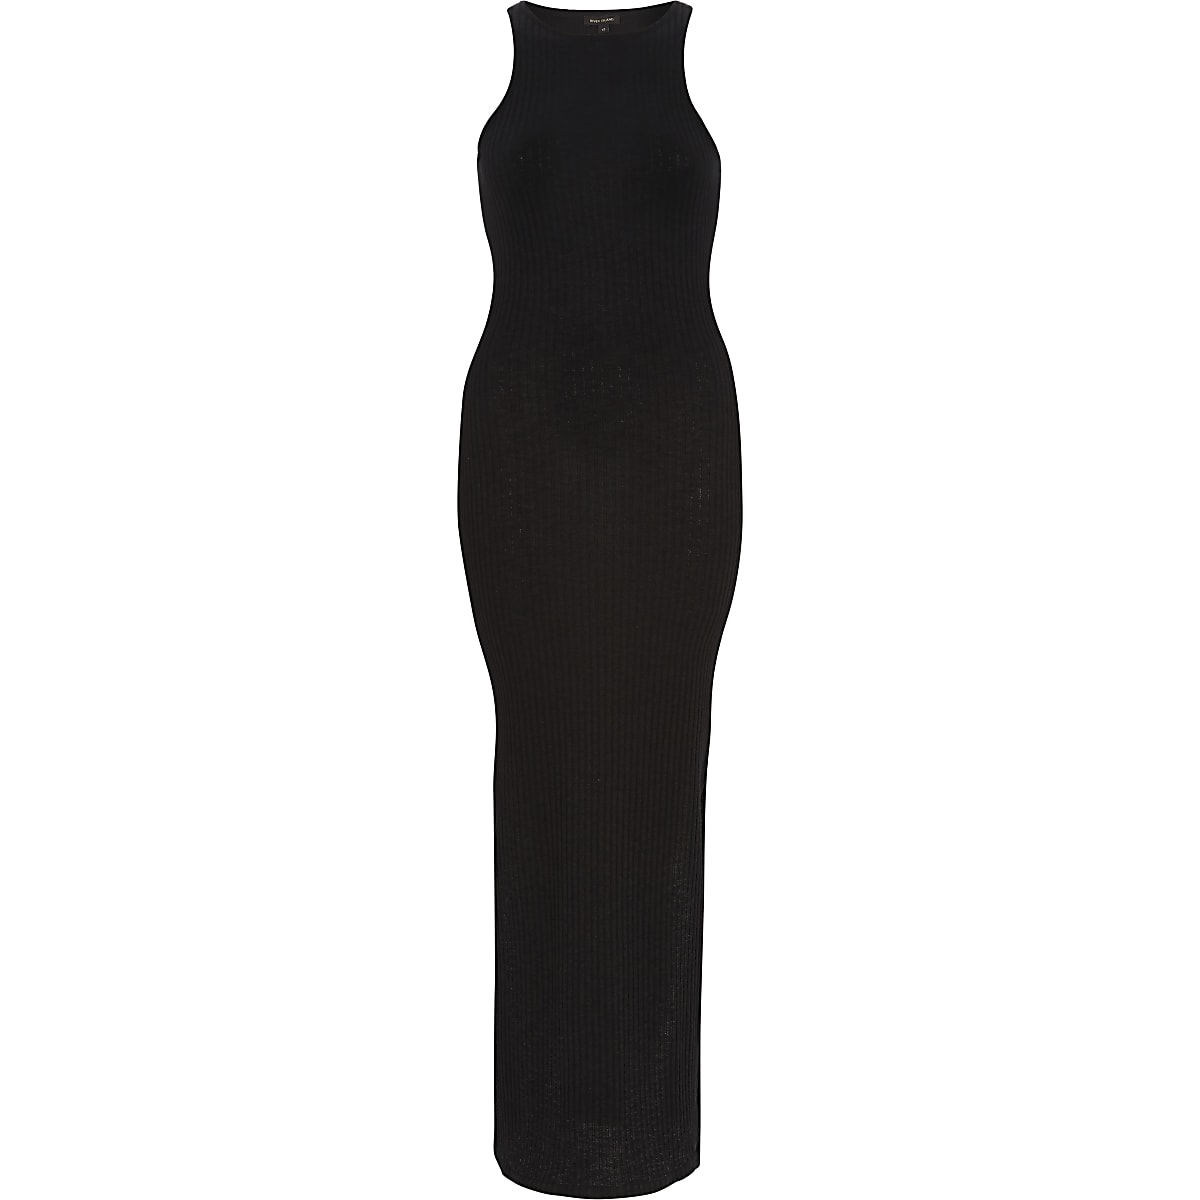 a477eea2 Black ribbed bodycon maxi dress - T-Shirt Dresses - Dresses - women